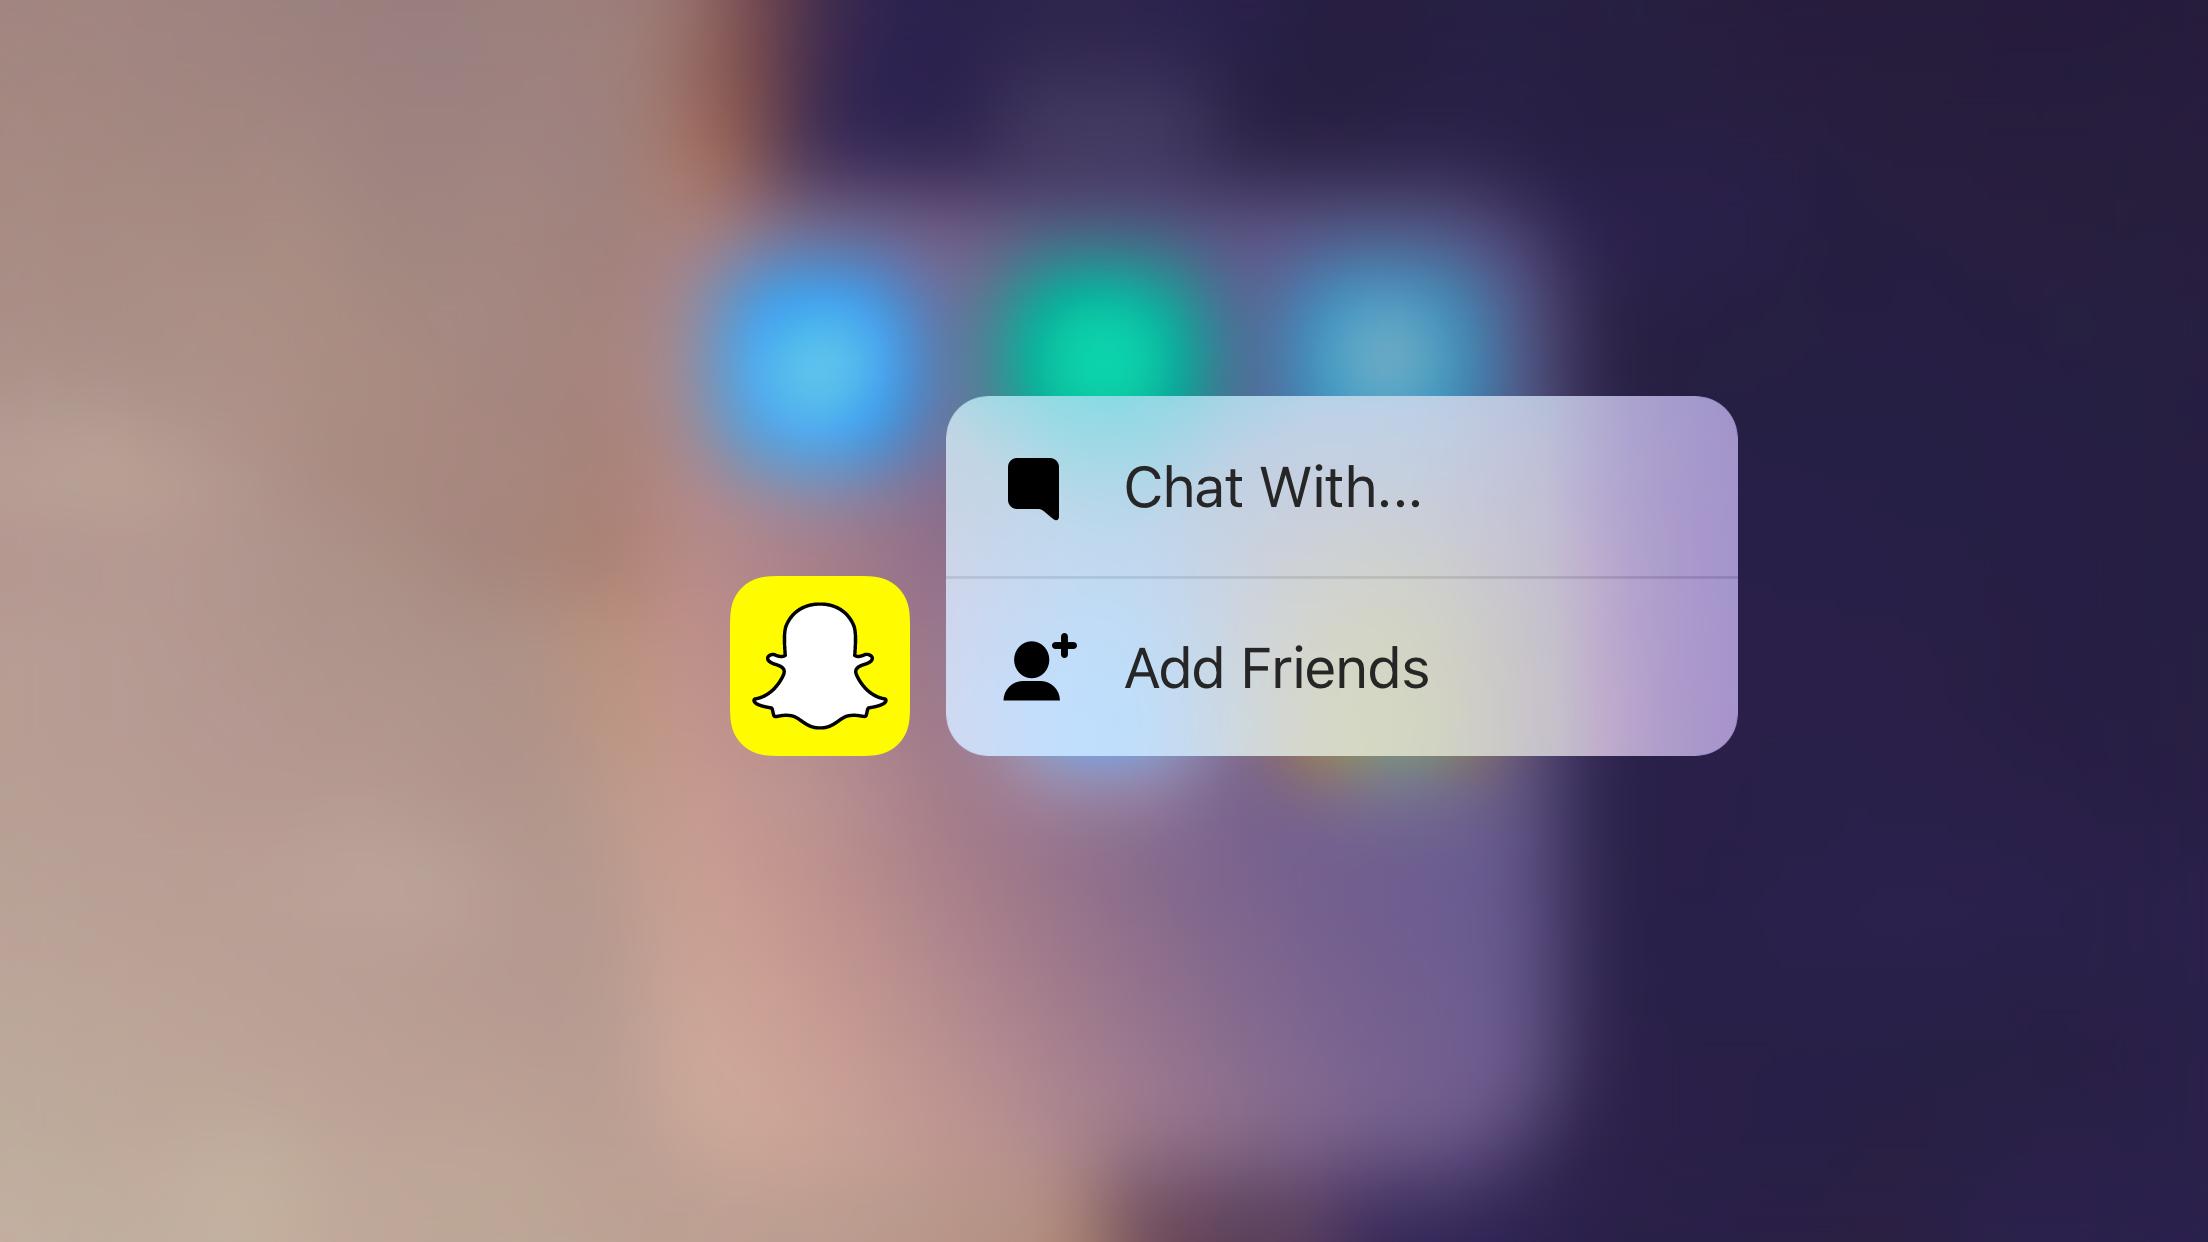 "<span href=""https://9to5mac.com/2015/10/28/snapchat-update-video-filters-slow-mo-fast-forward-rewind-3d-touch/"">Snapchat actualización agrega slow-mo, avance rápido, & rewind efectos de vídeo + 3D con soporte Táctil</a>"